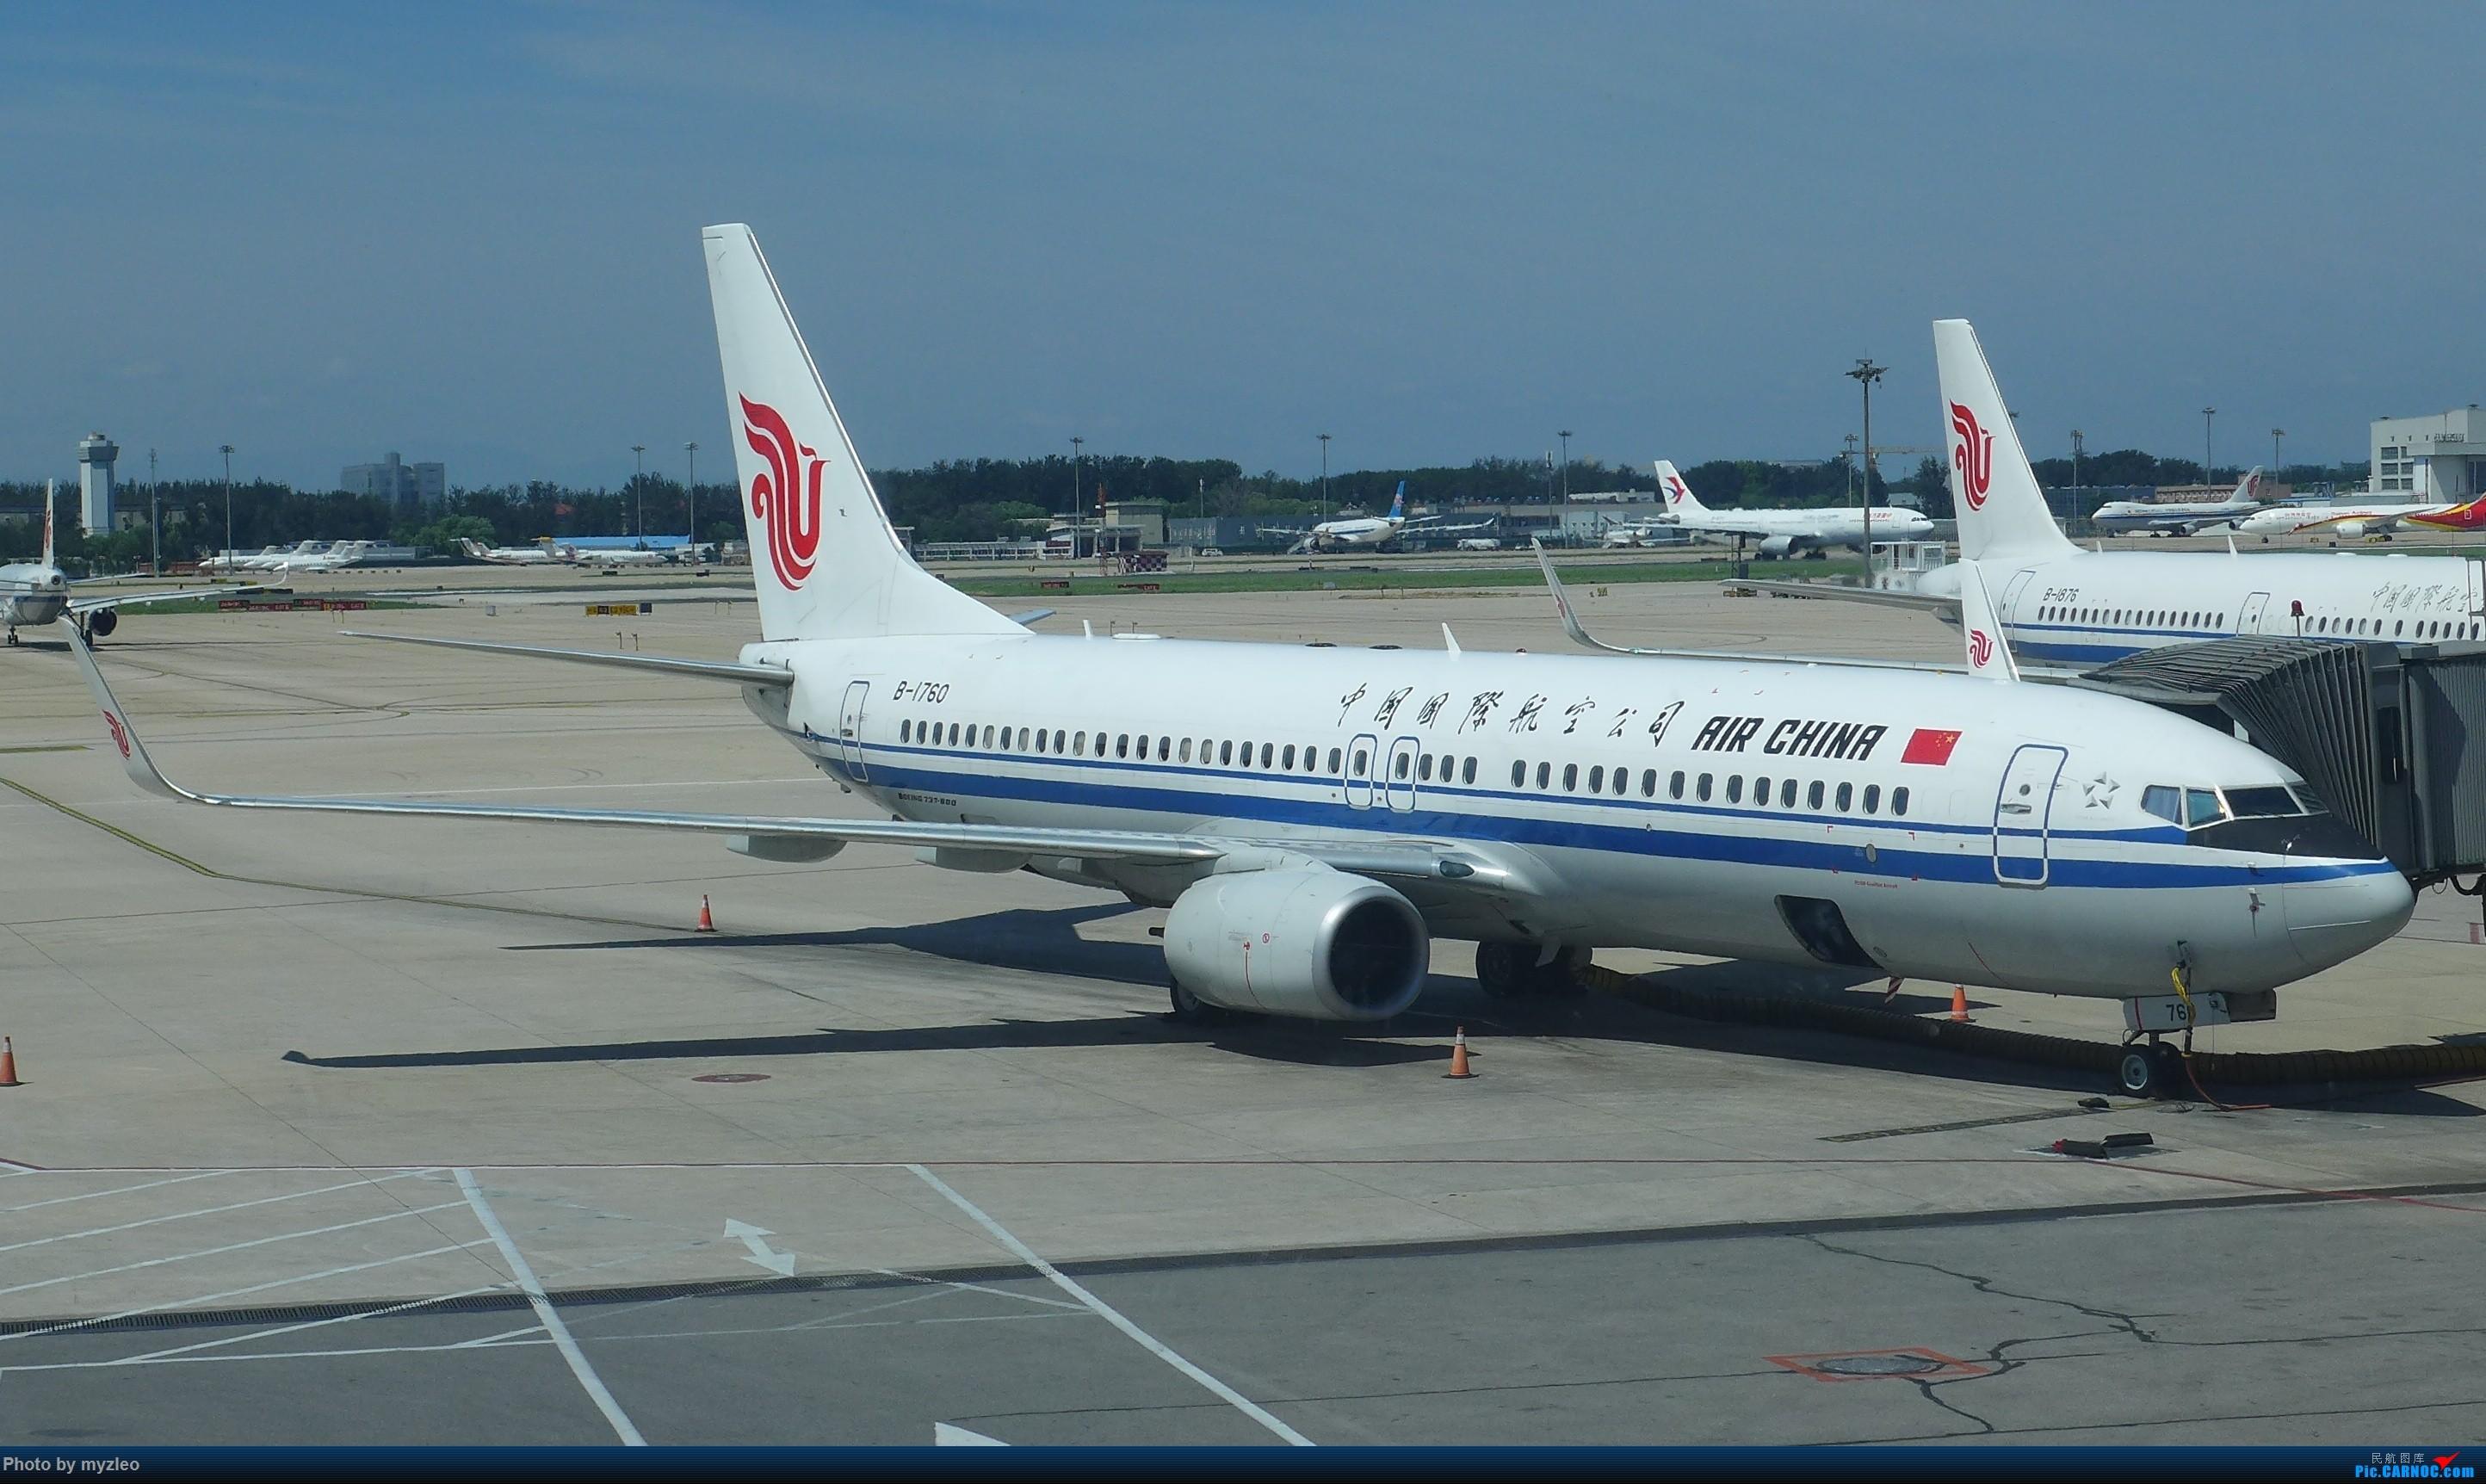 Re:[原创]【myzleo的游记3.1】三访帝都——记一次意外的惊喜,大鹅头初遇,第一次去中关村 BOEING 737-800 B-1760 中国北京首都国际机场